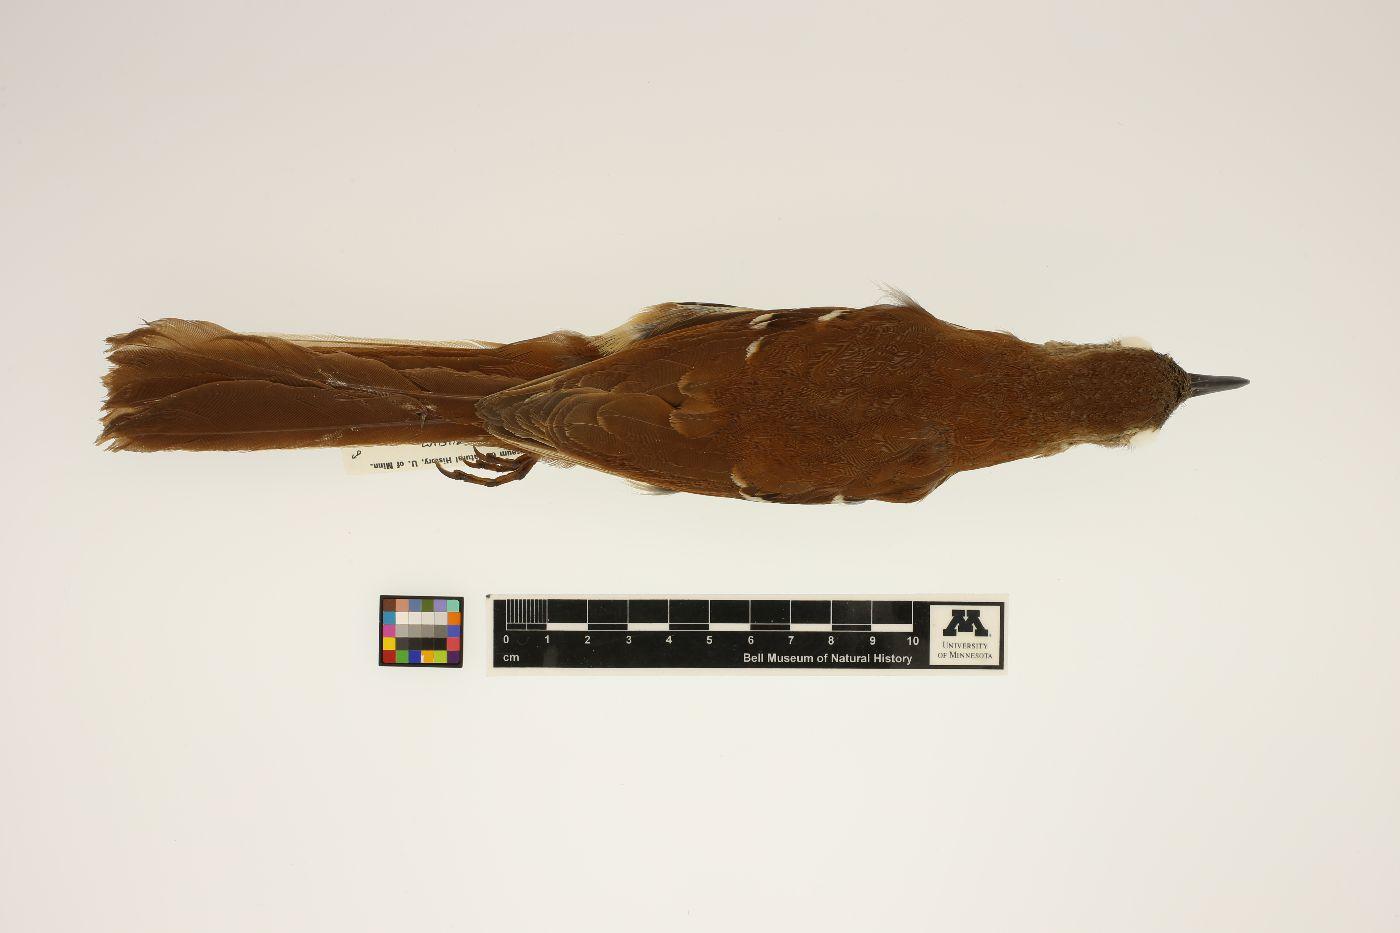 Toxostoma image